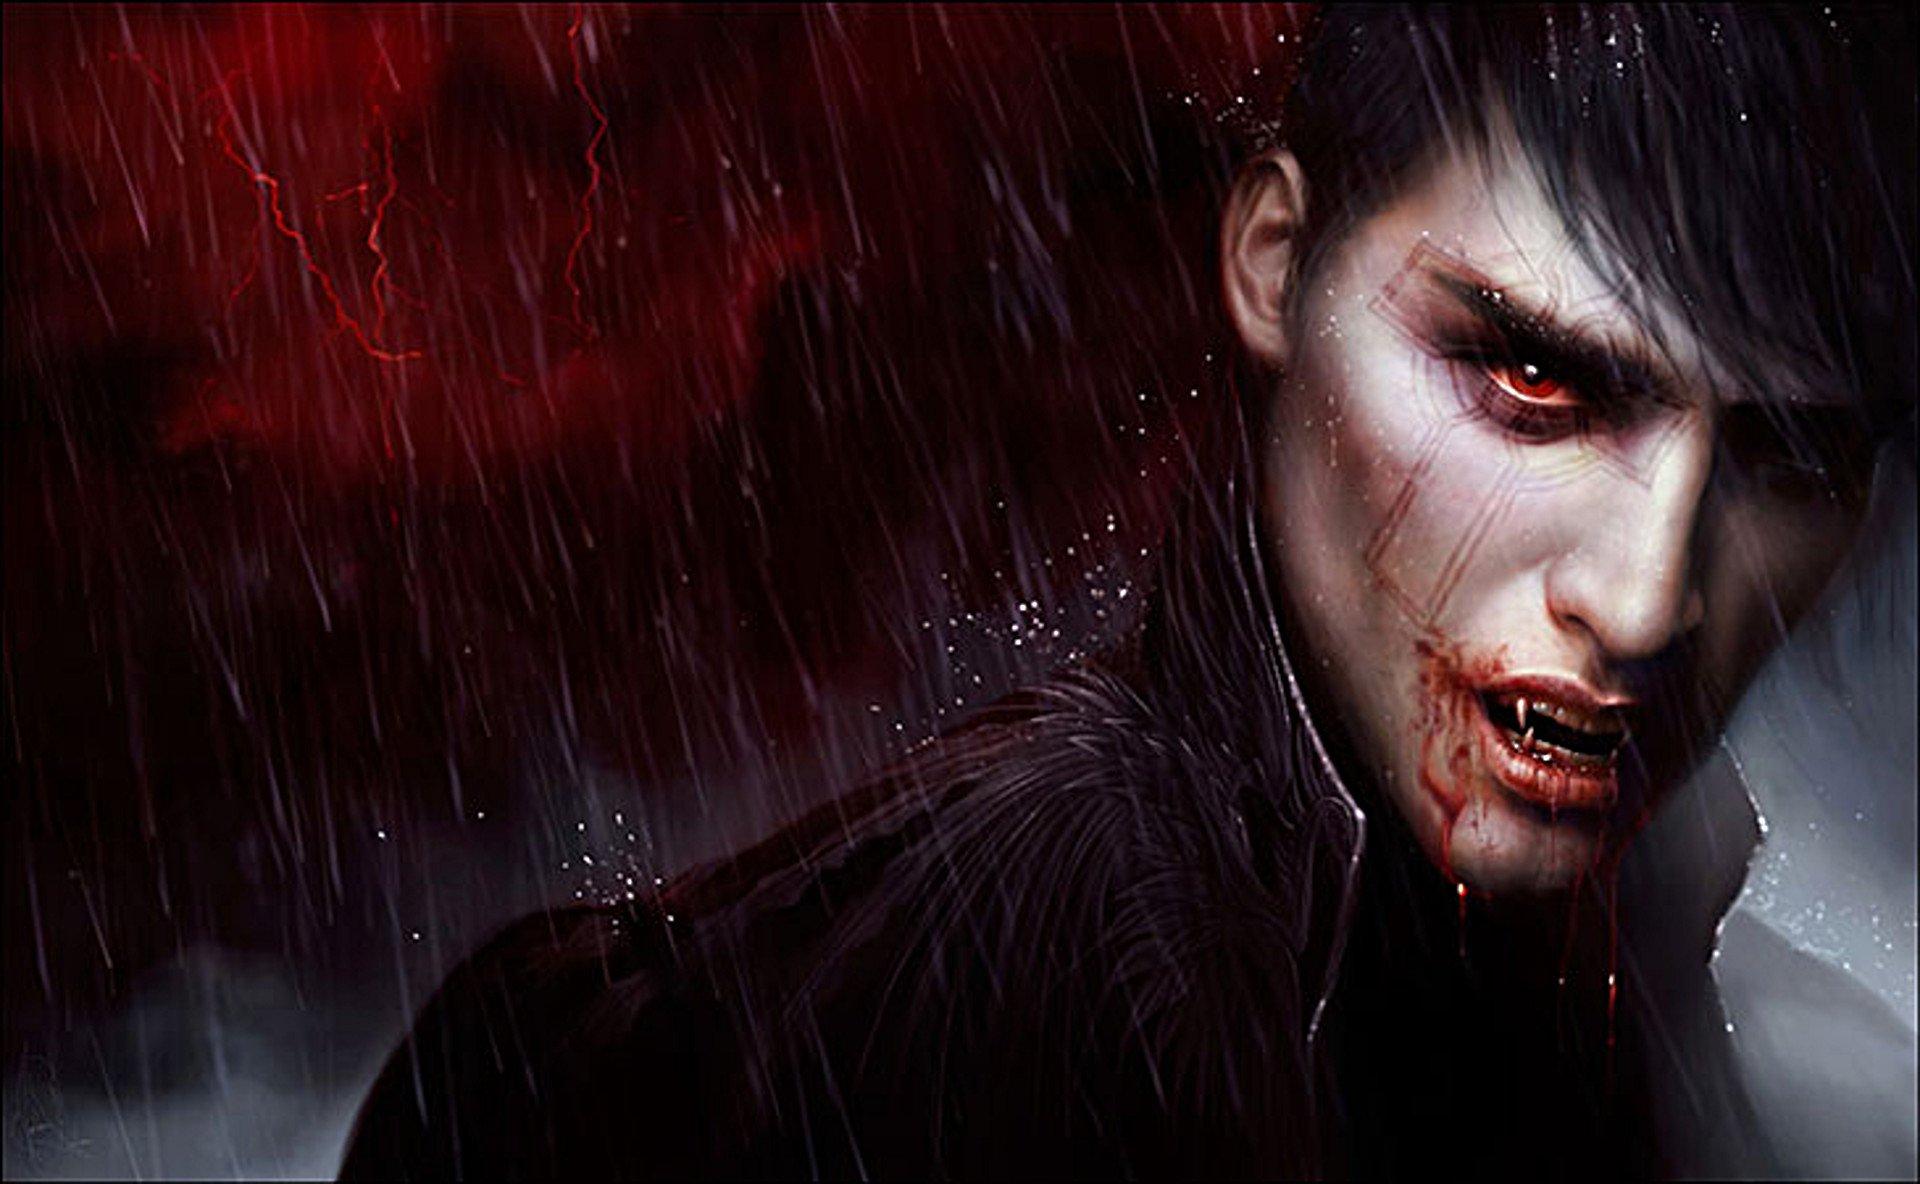 Fantasy Art Vampires Wallpapers Hd Desktop And Mobile: Immortality HD Wallpaper